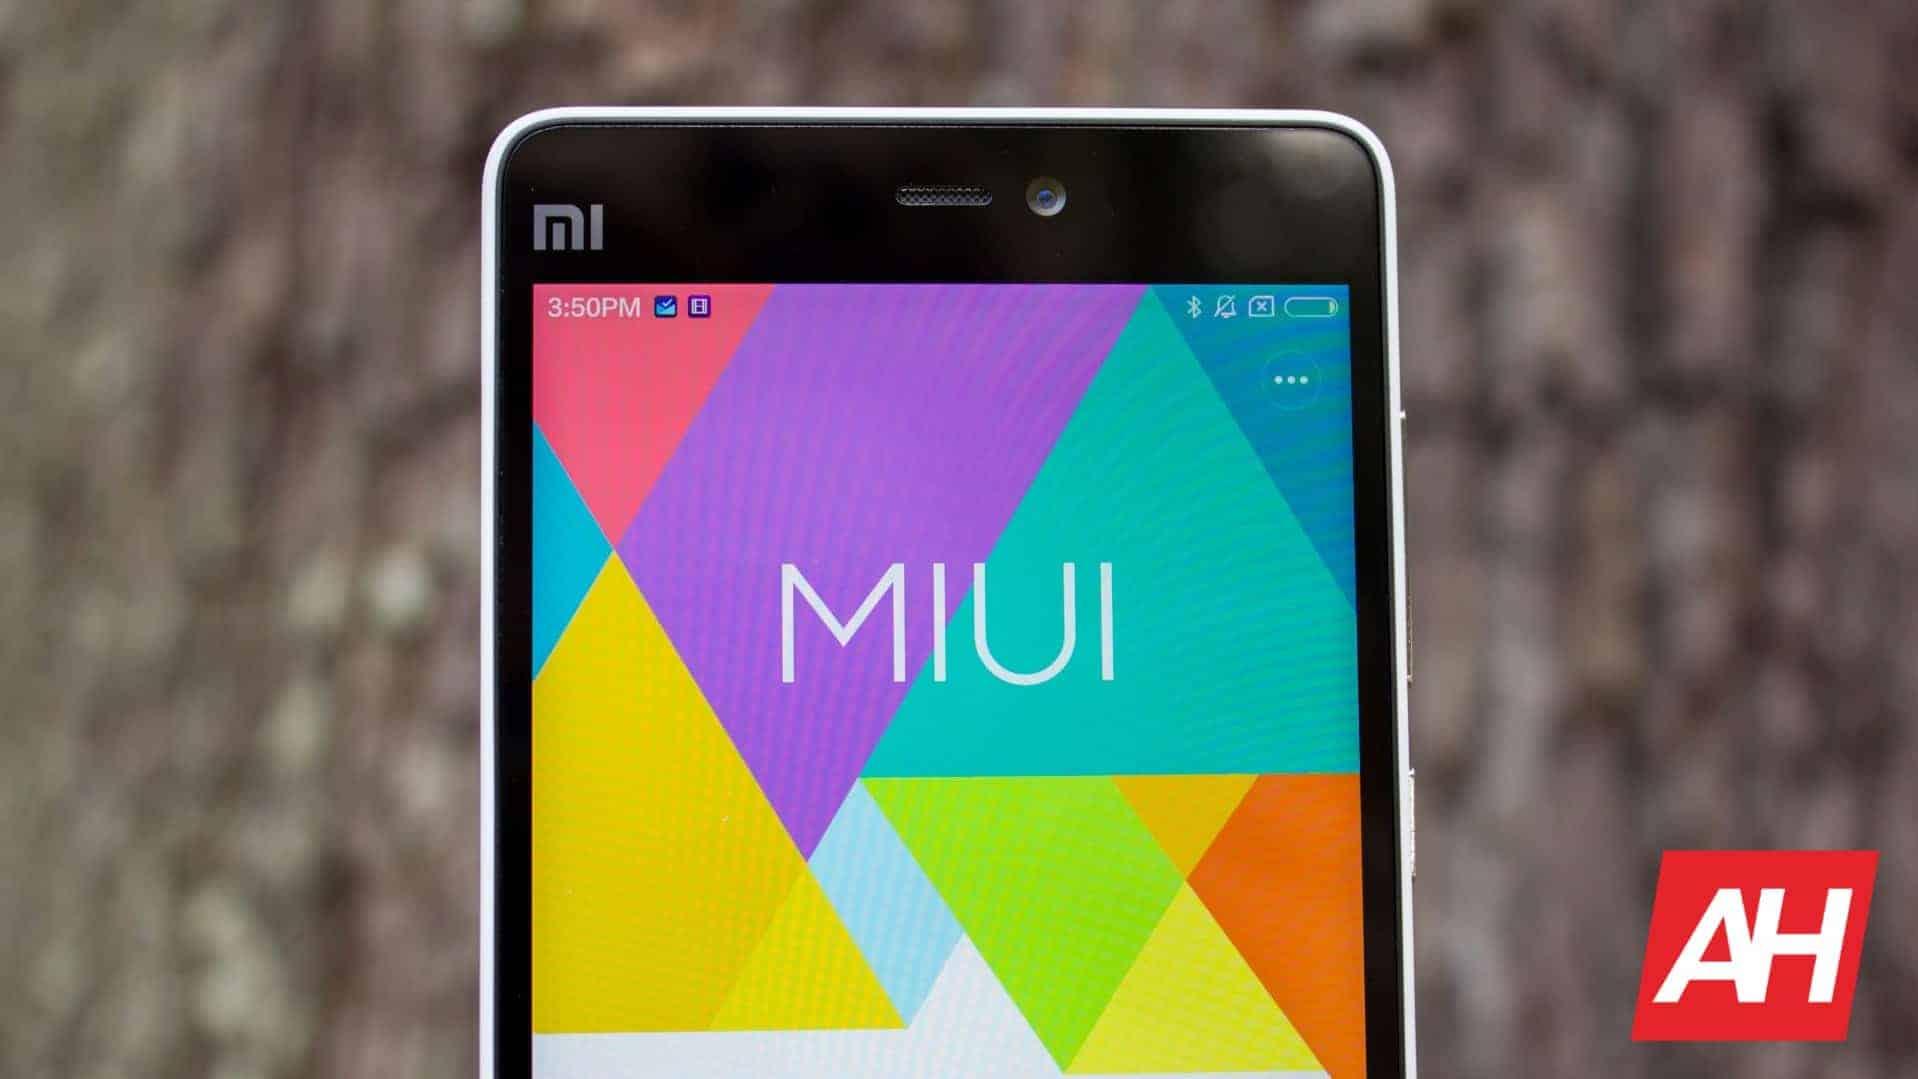 AH MIUI logo image 1